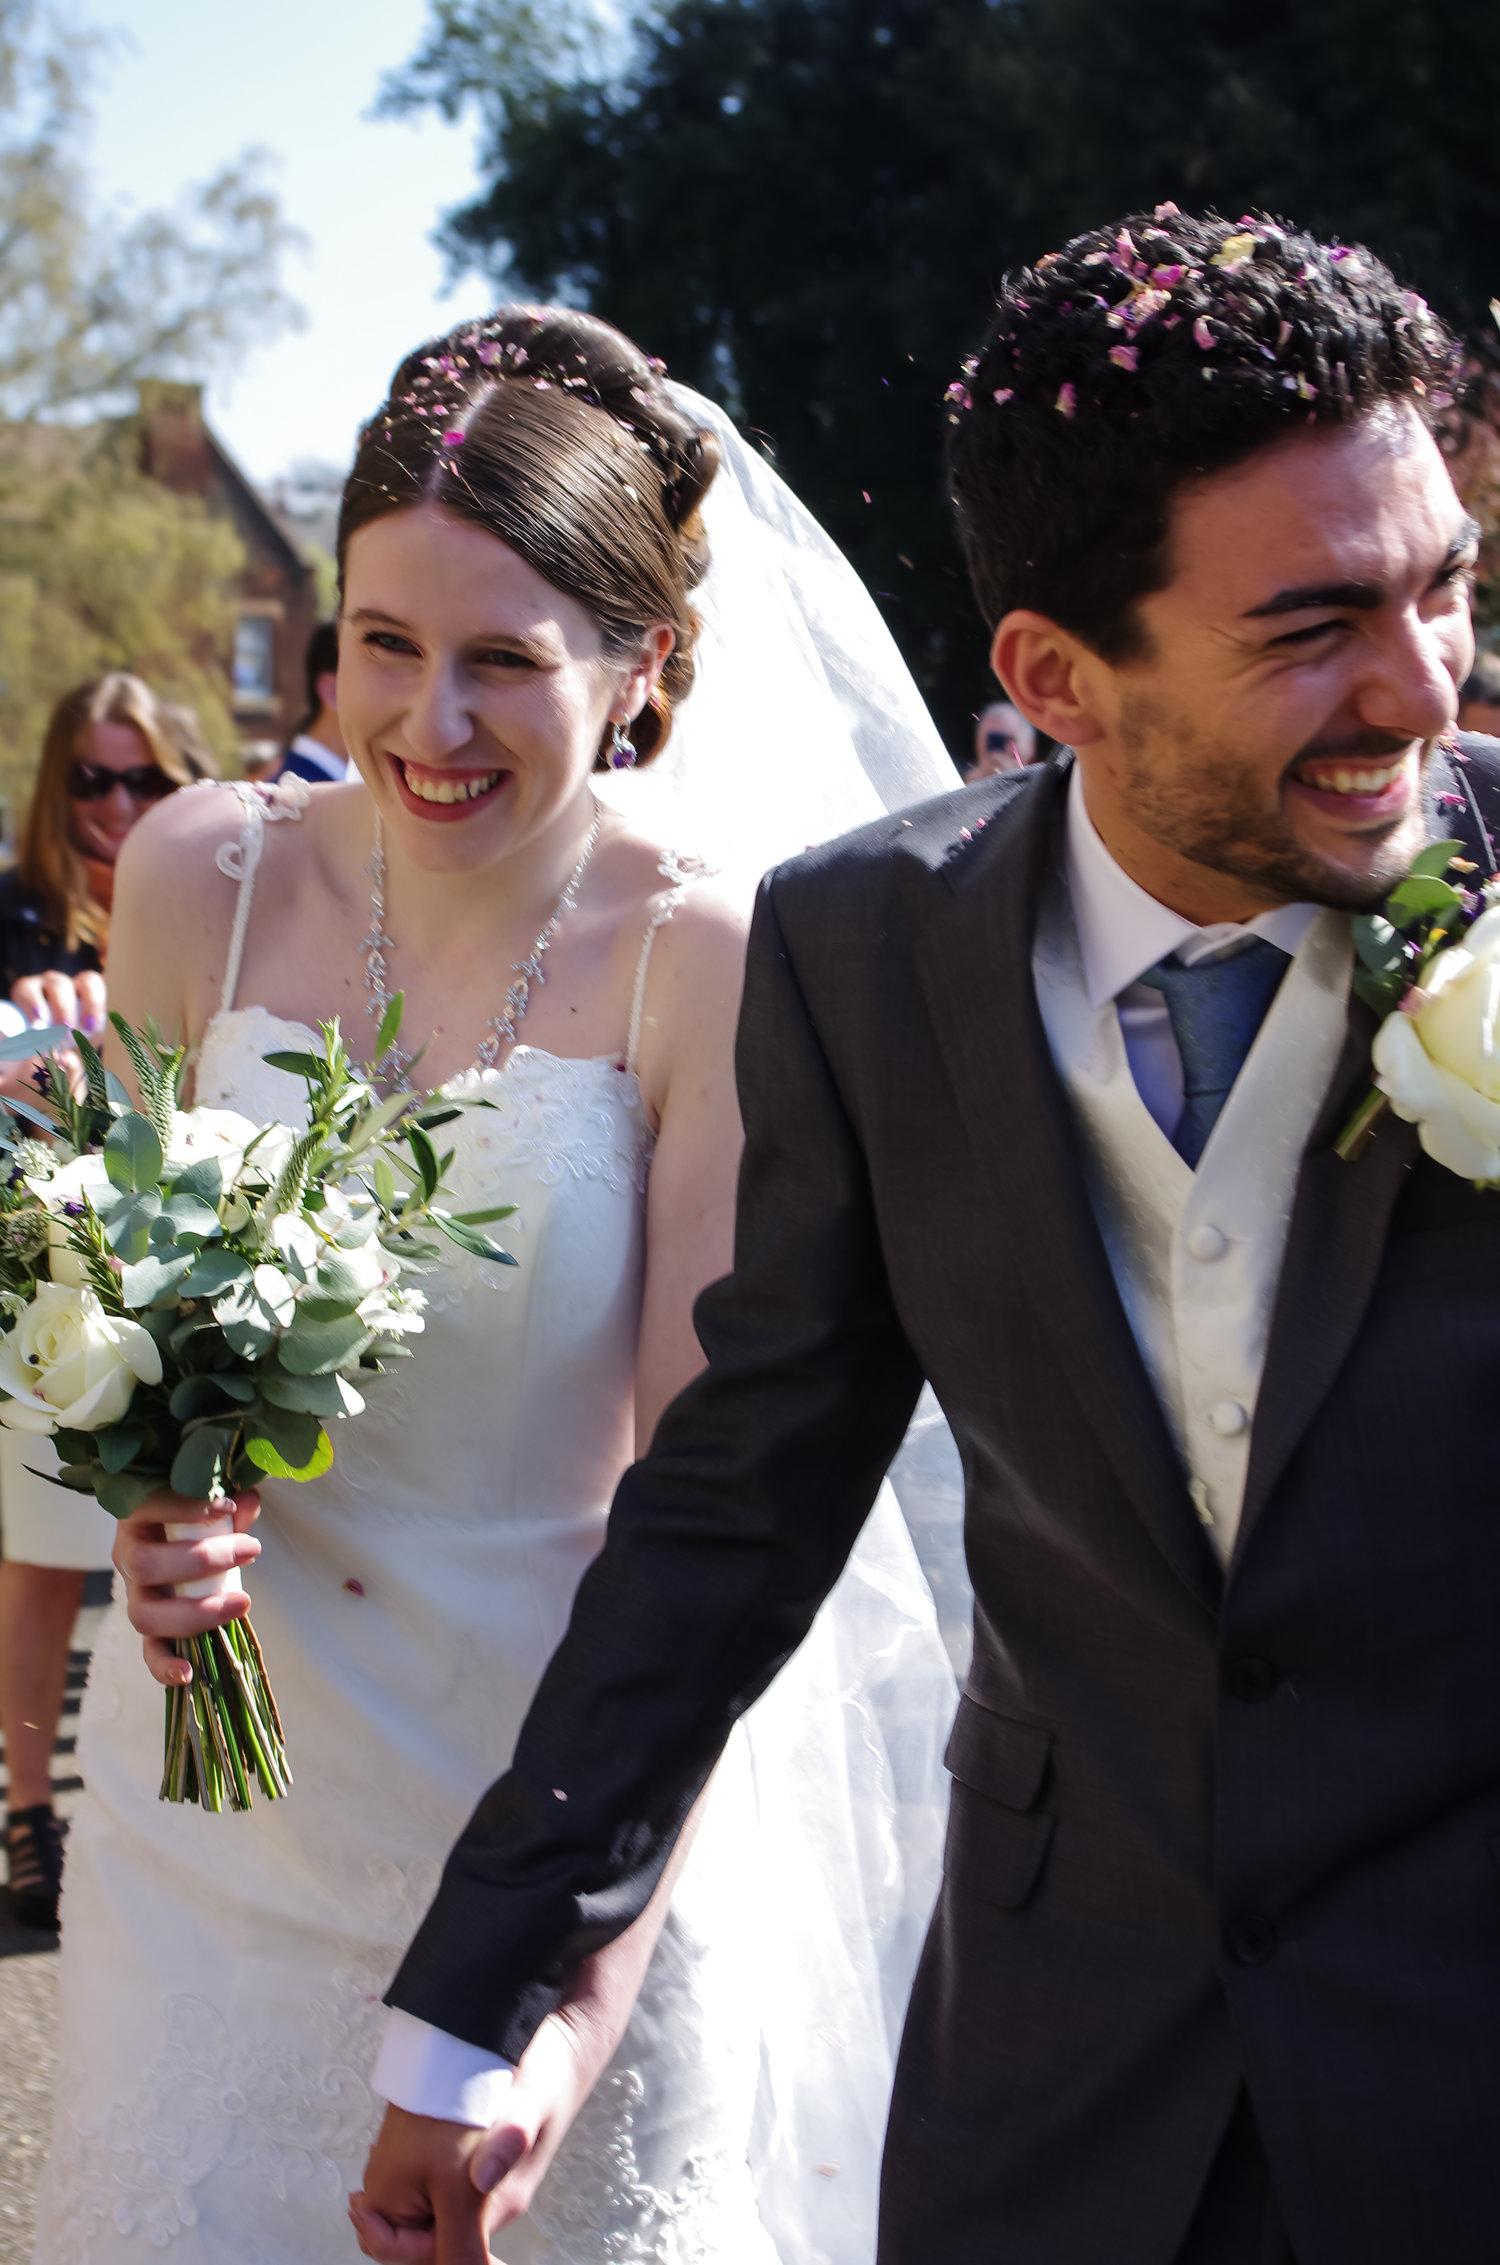 Siana+and+Vittorio+Bridal+Bouquet.jpg